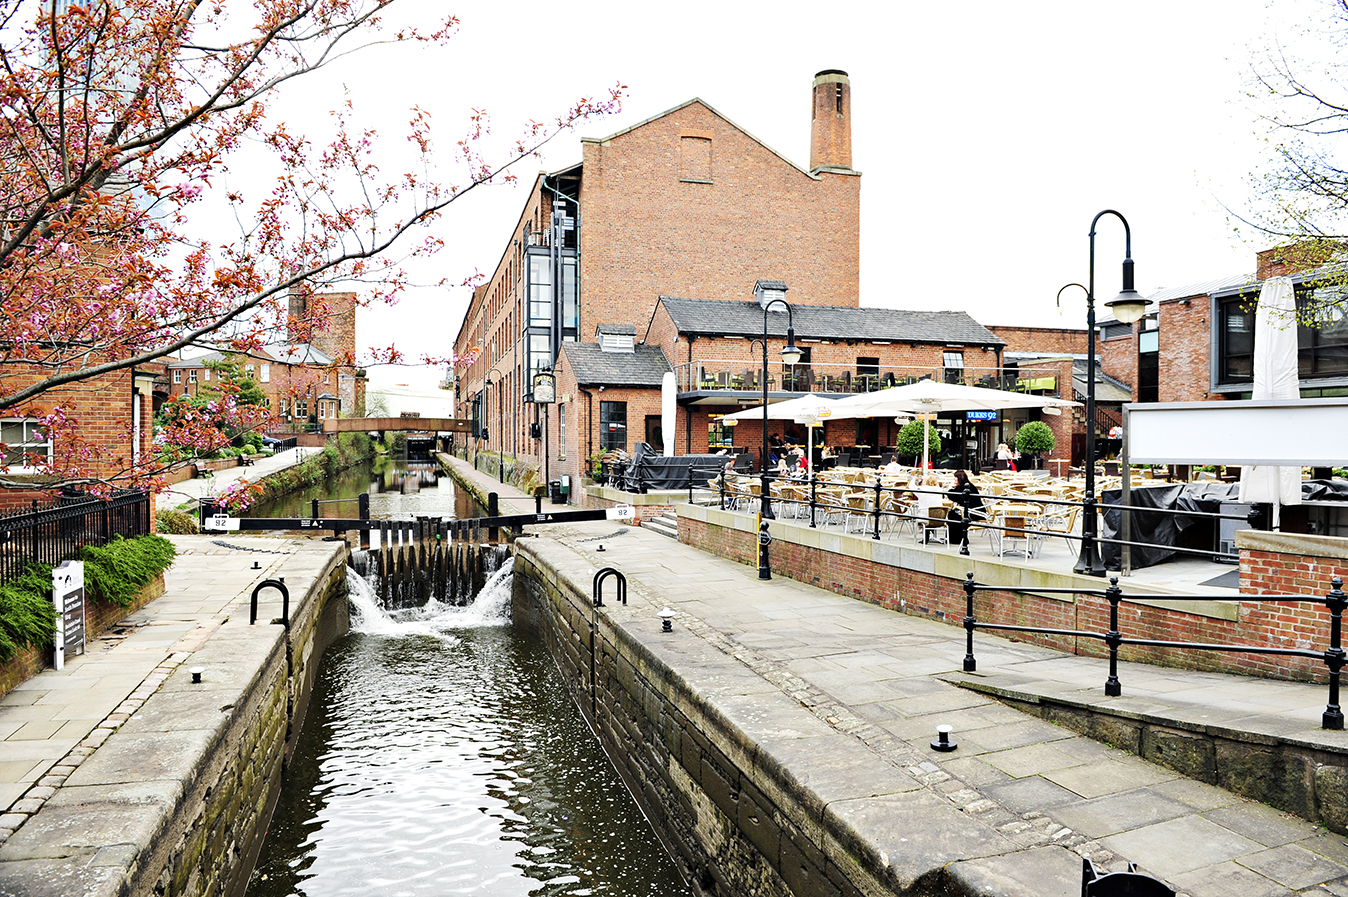 Deansgate Locks in Manchester